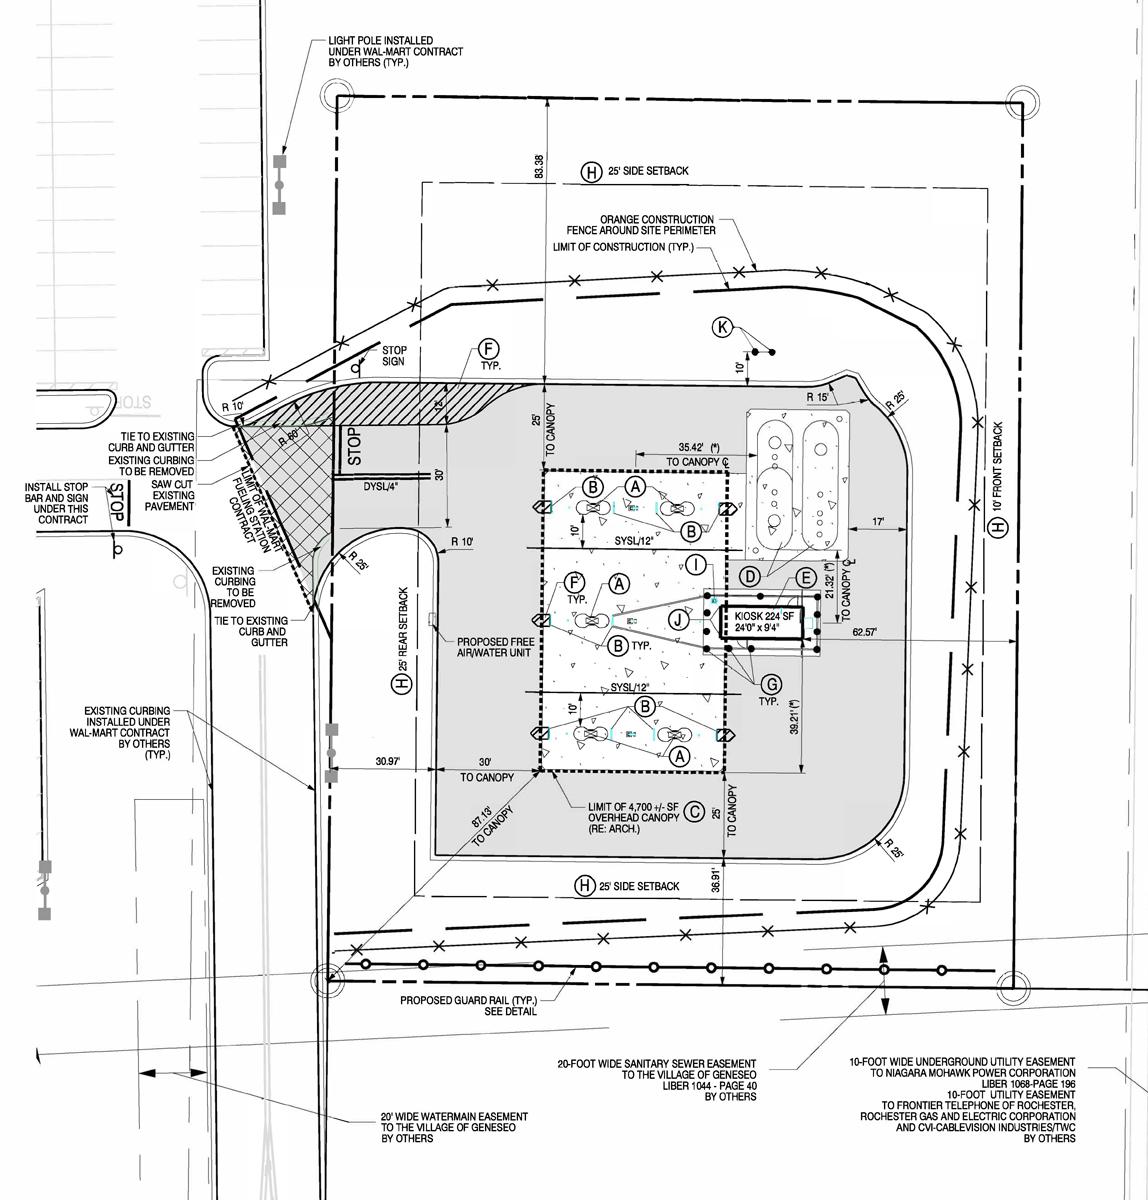 walmart-gas-station-site-plan.jpg